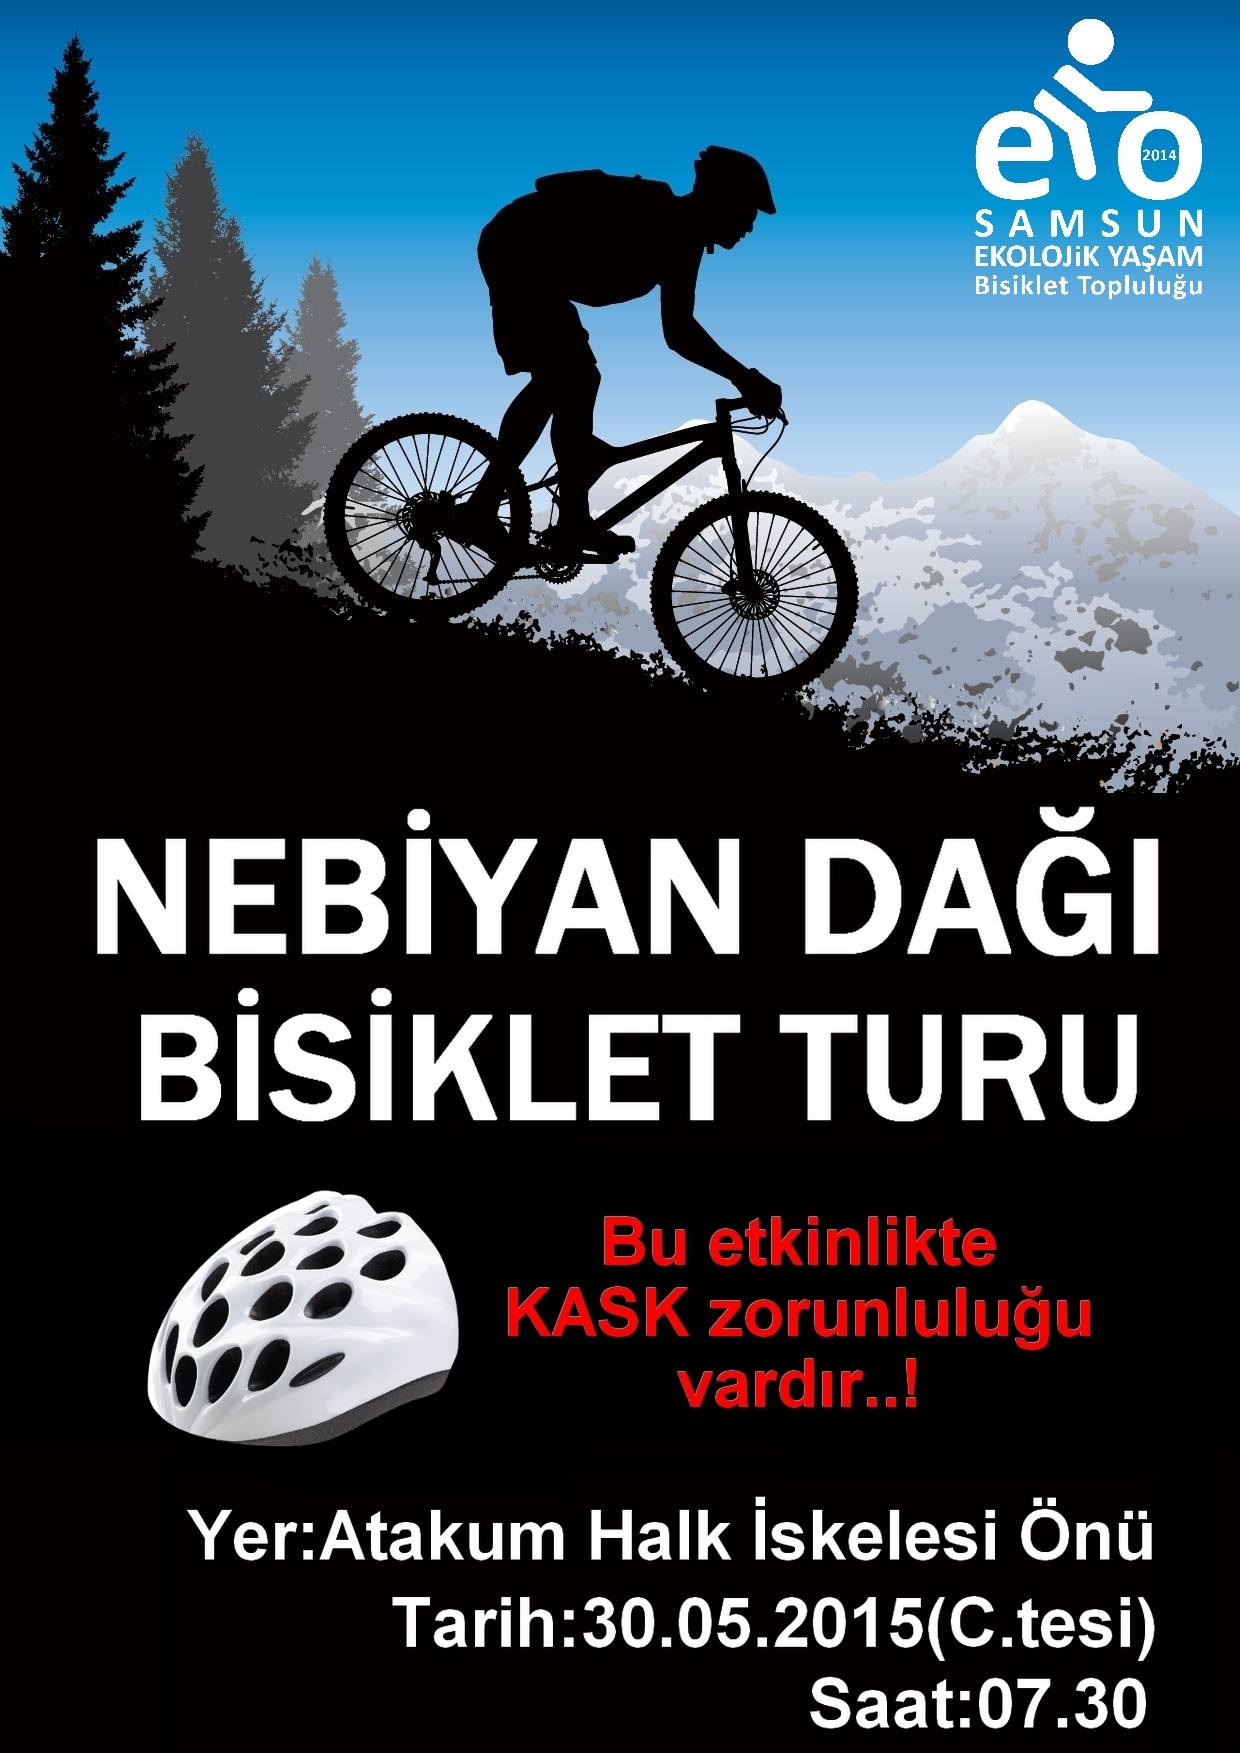 Nebiyan Dağı Bisiklet Turu